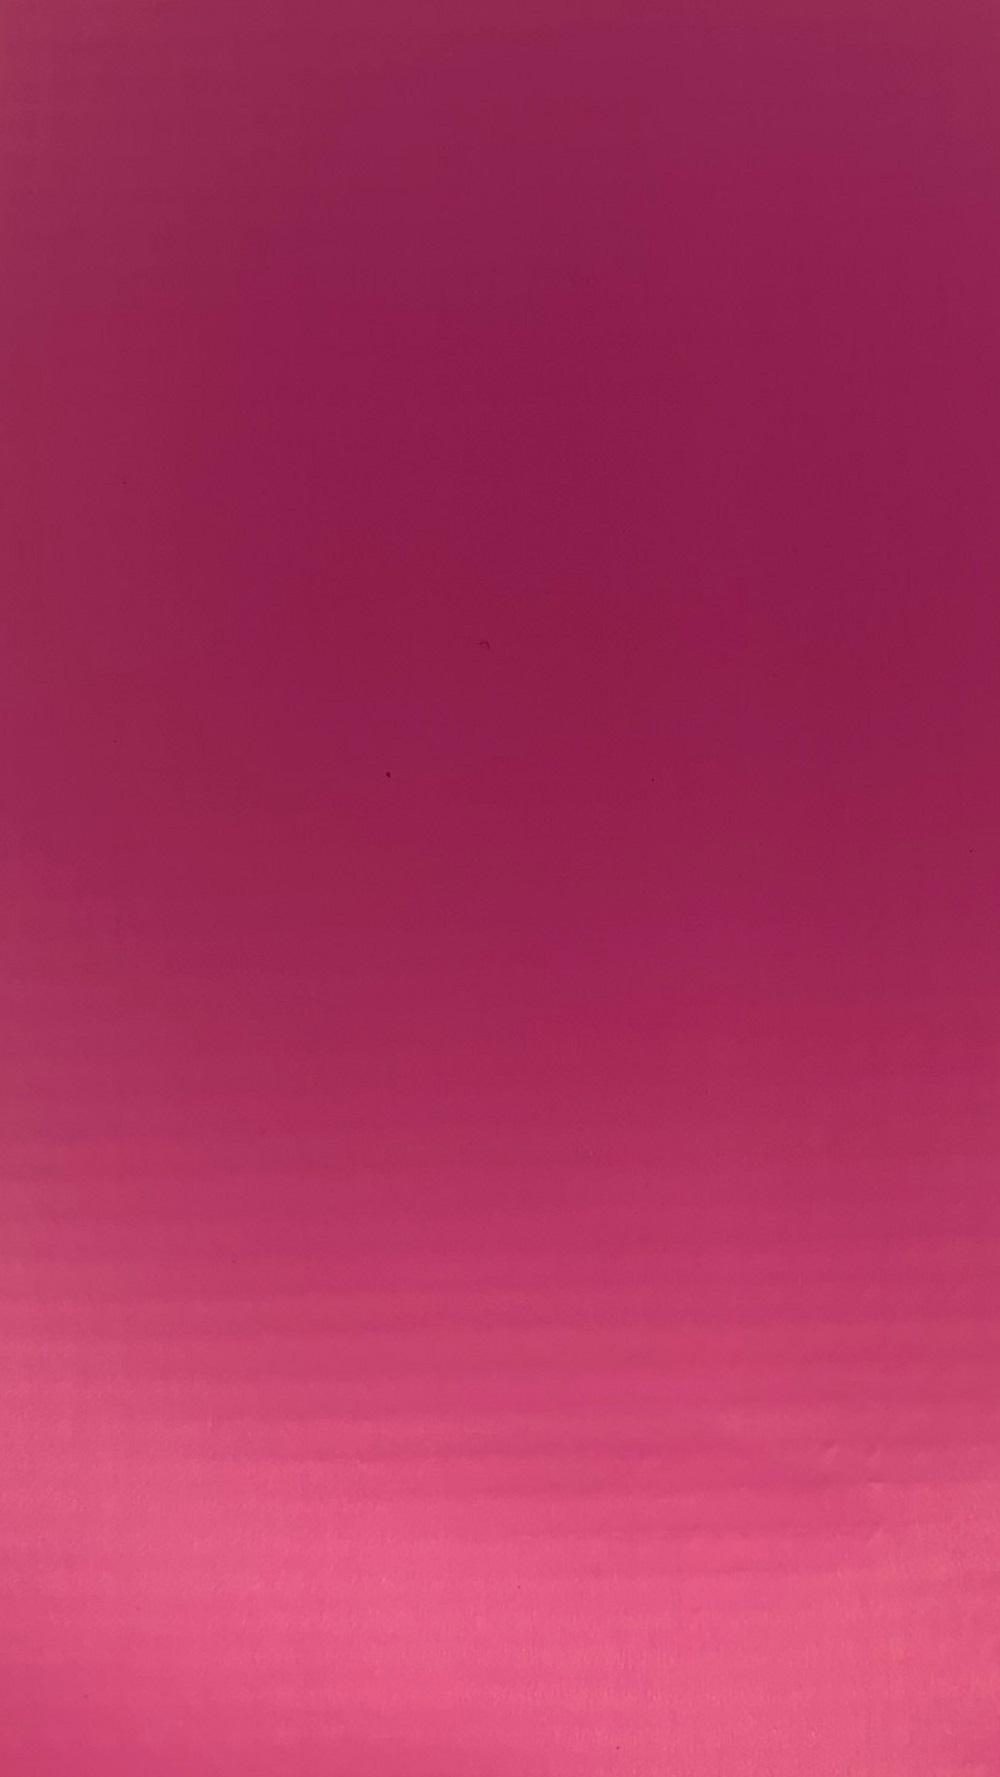 Lona Vinilona Df Fosca Rosa S-185 1,45mt X 1,0mt